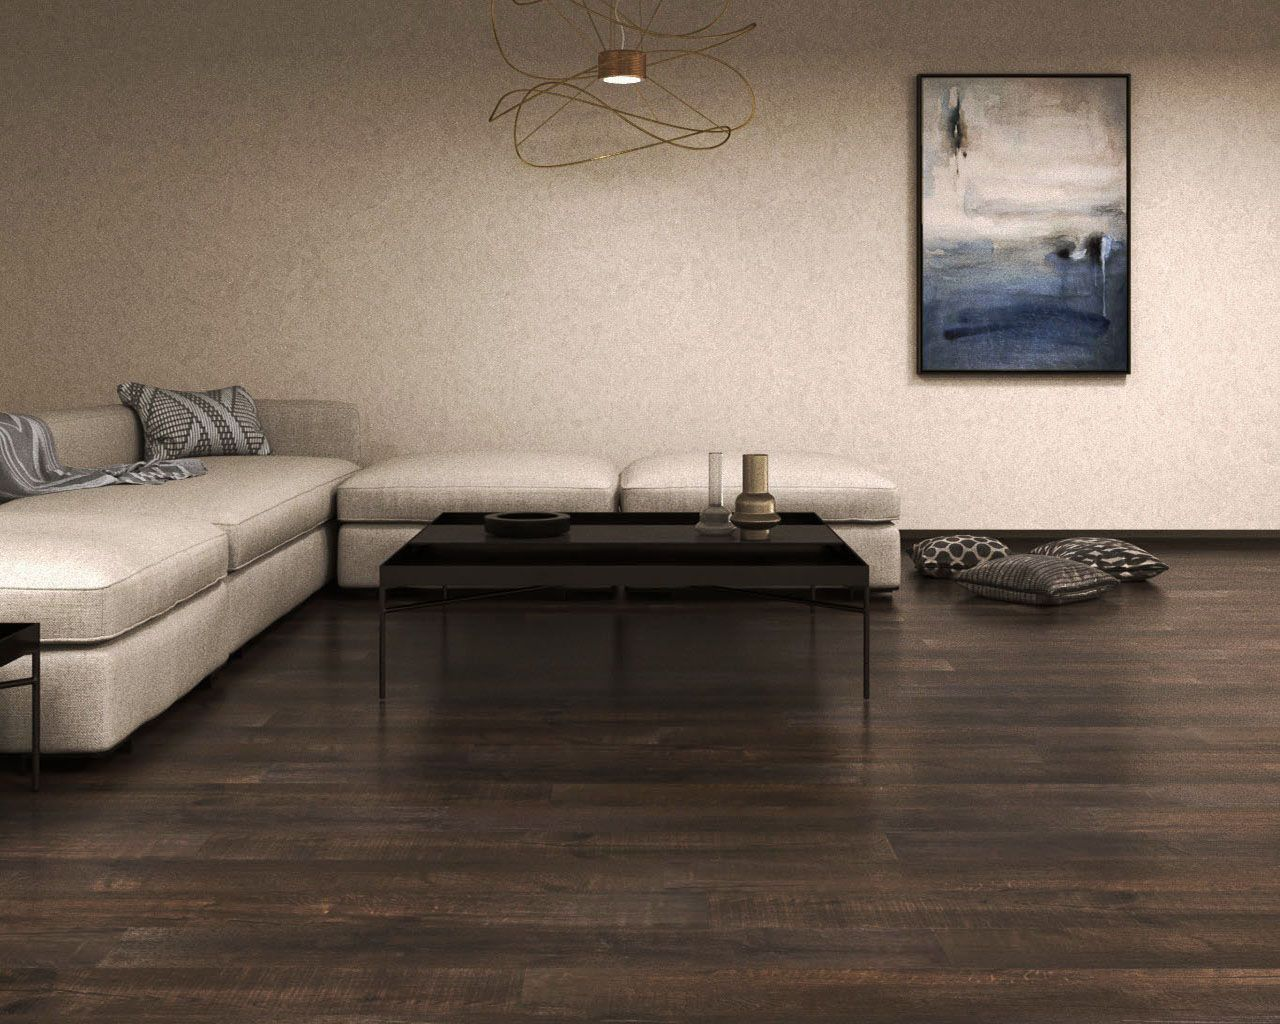 Maxifloor Sense Wenge 5 5 Mm Waterproof Floor Waterproof